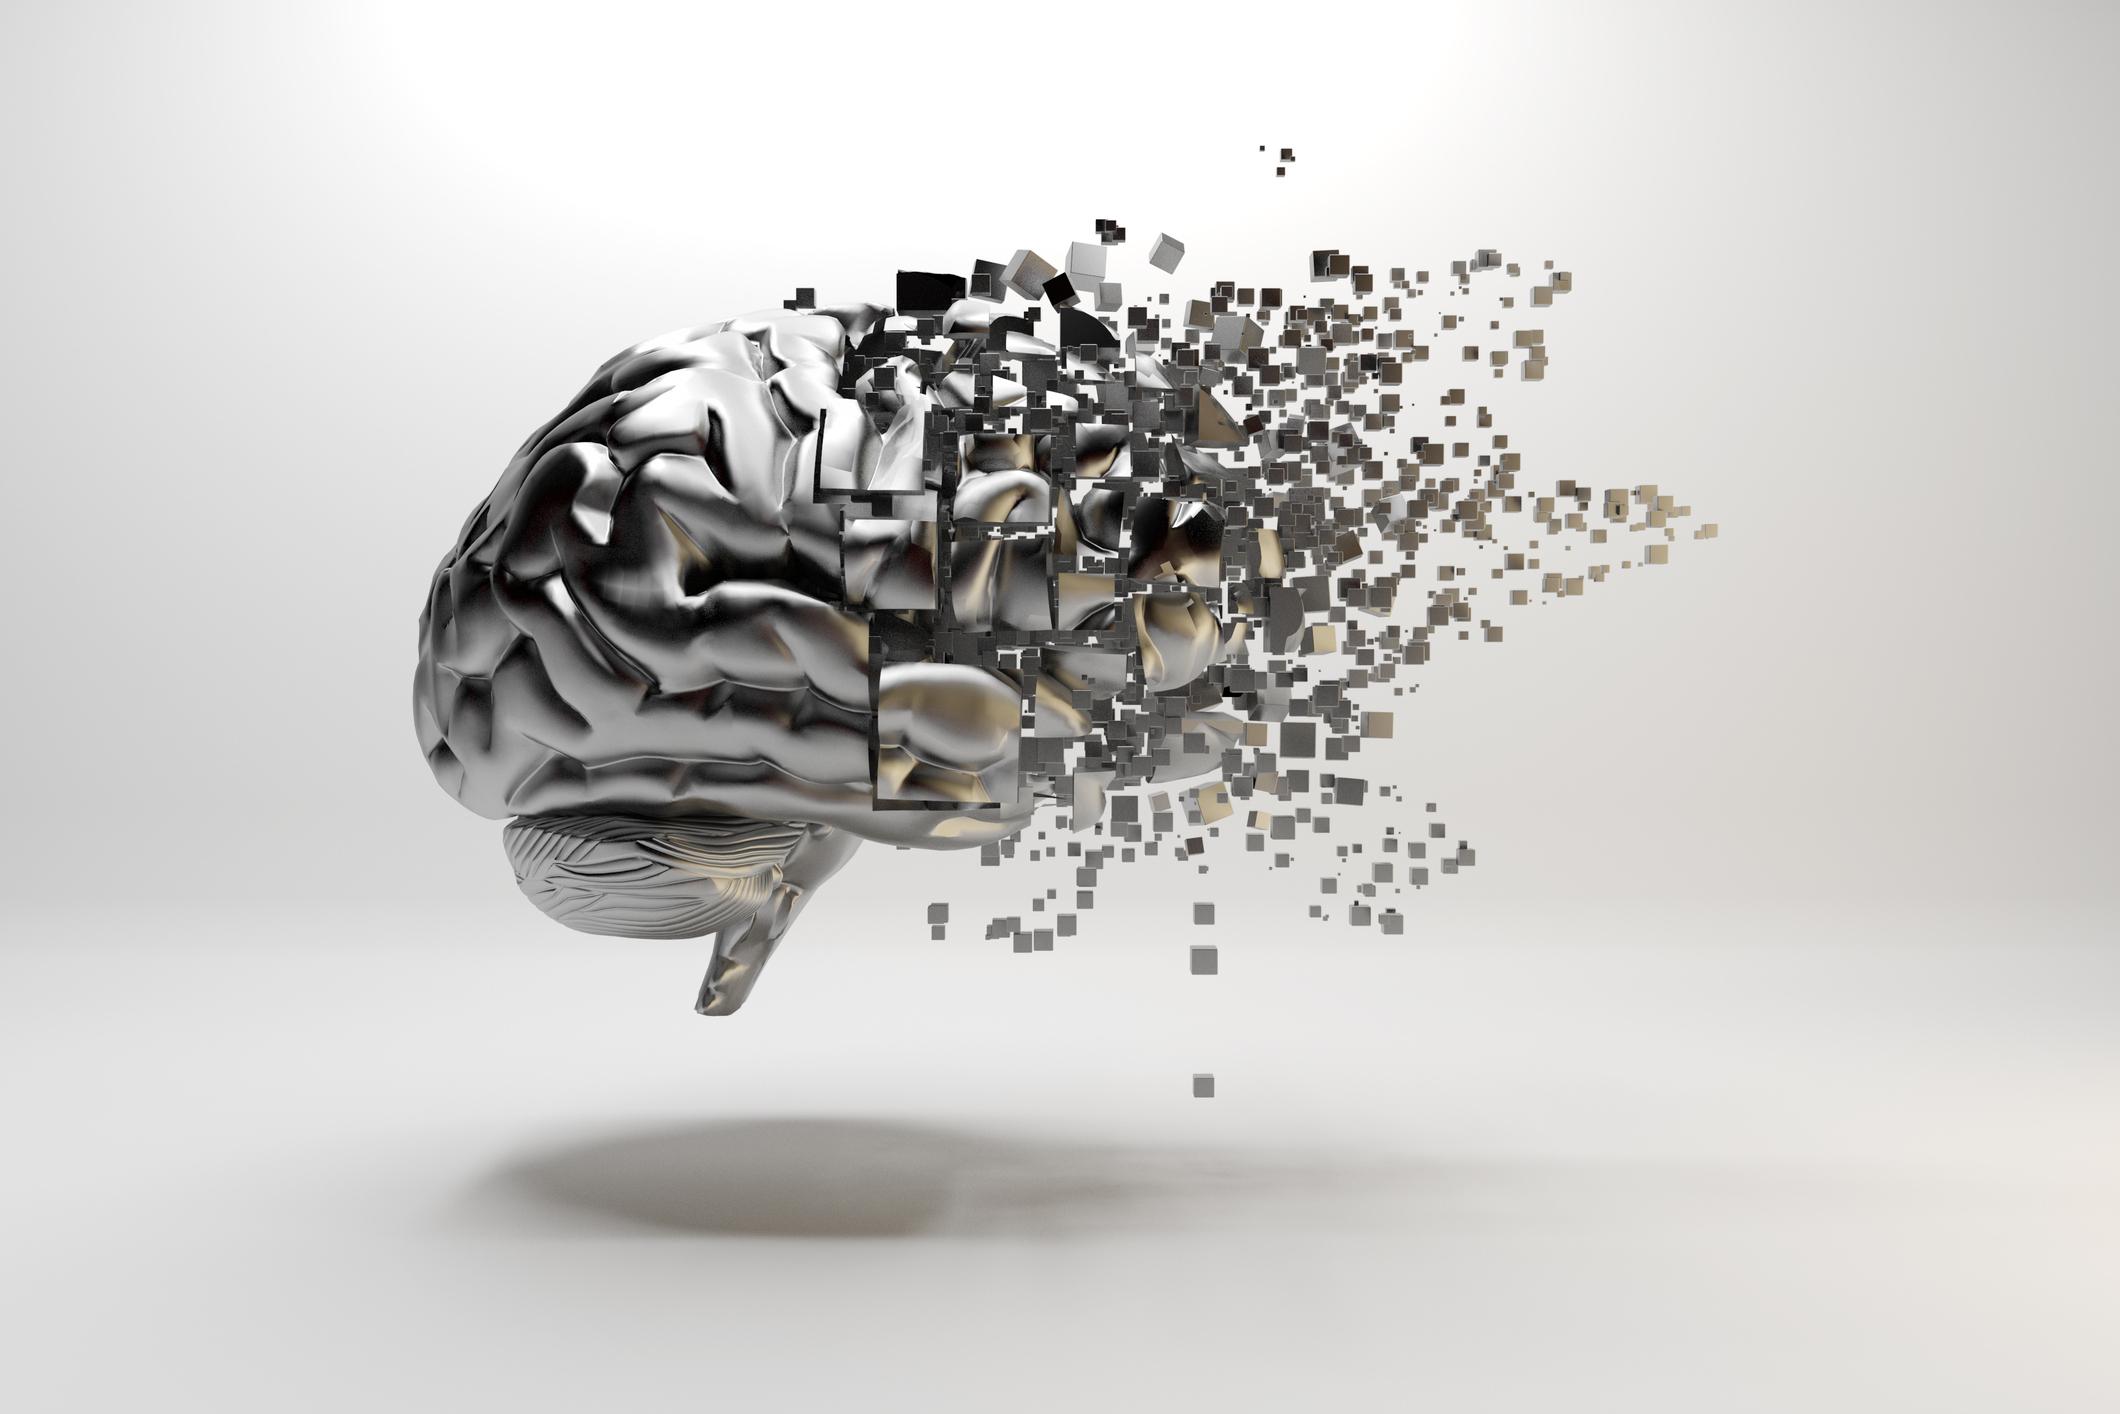 A brain morphing into digital blocks